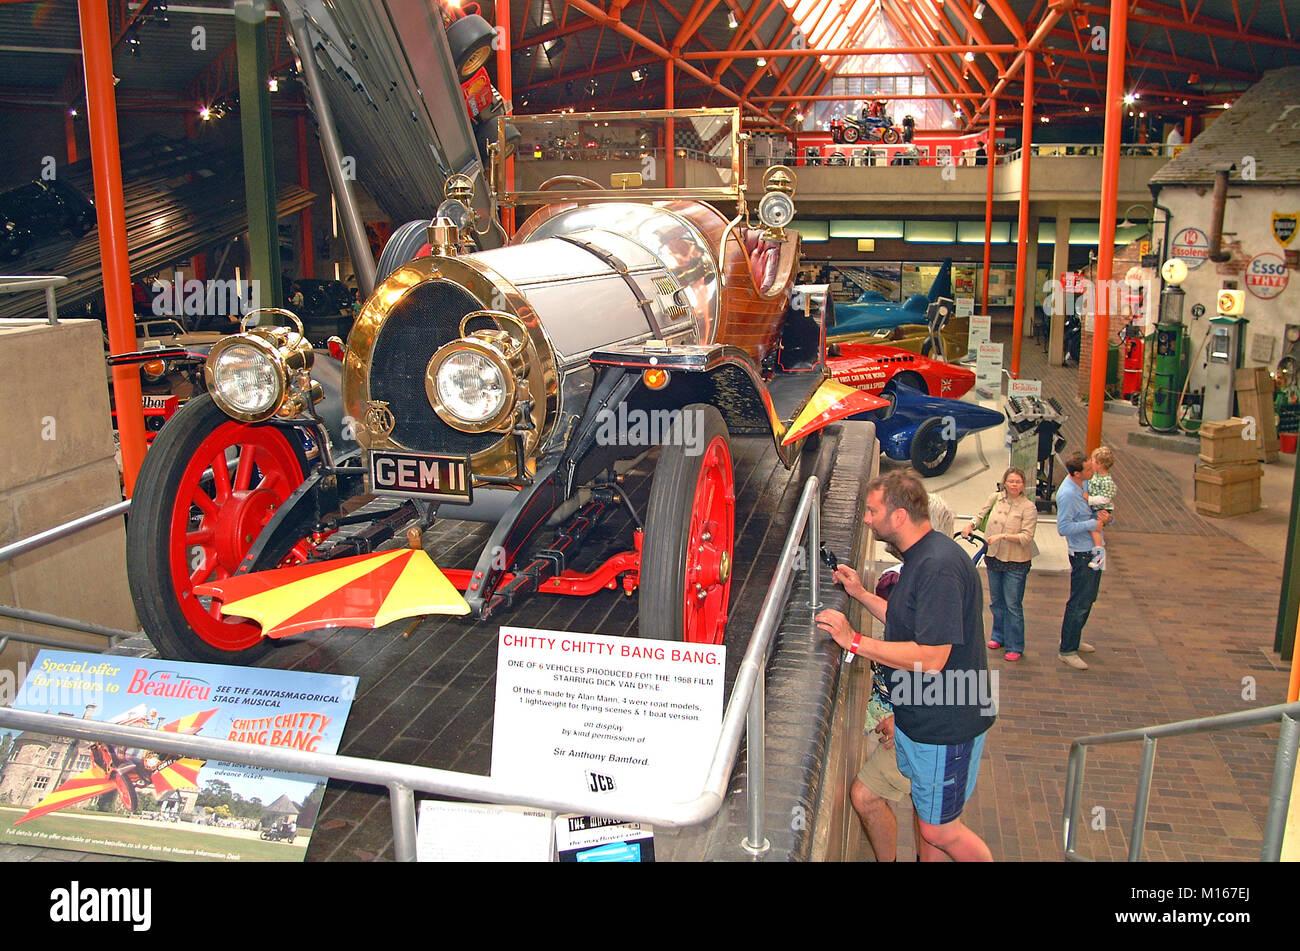 Chitty Chitty Bang Bang Auto innen das National Motor Museum in Beaulieu, New Forest, Hampshire, England, Großbritannien, Stockbild